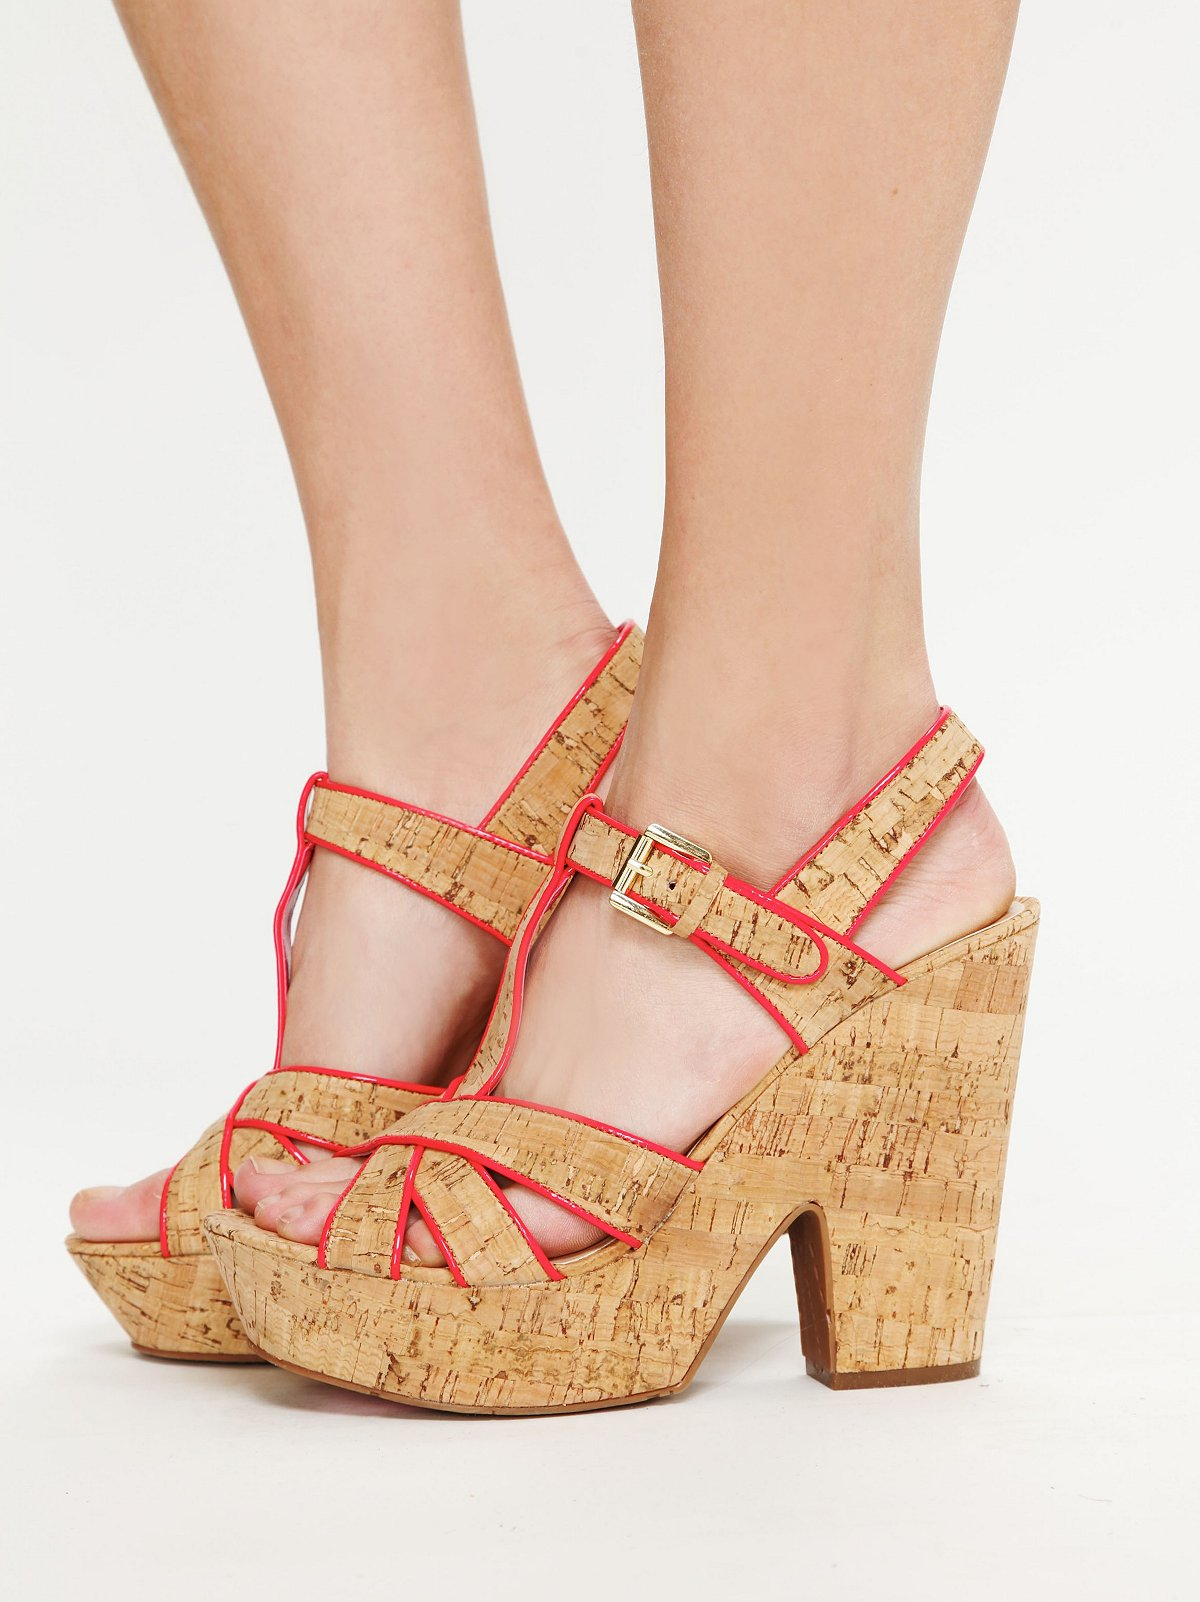 Sonoma Cork Heel